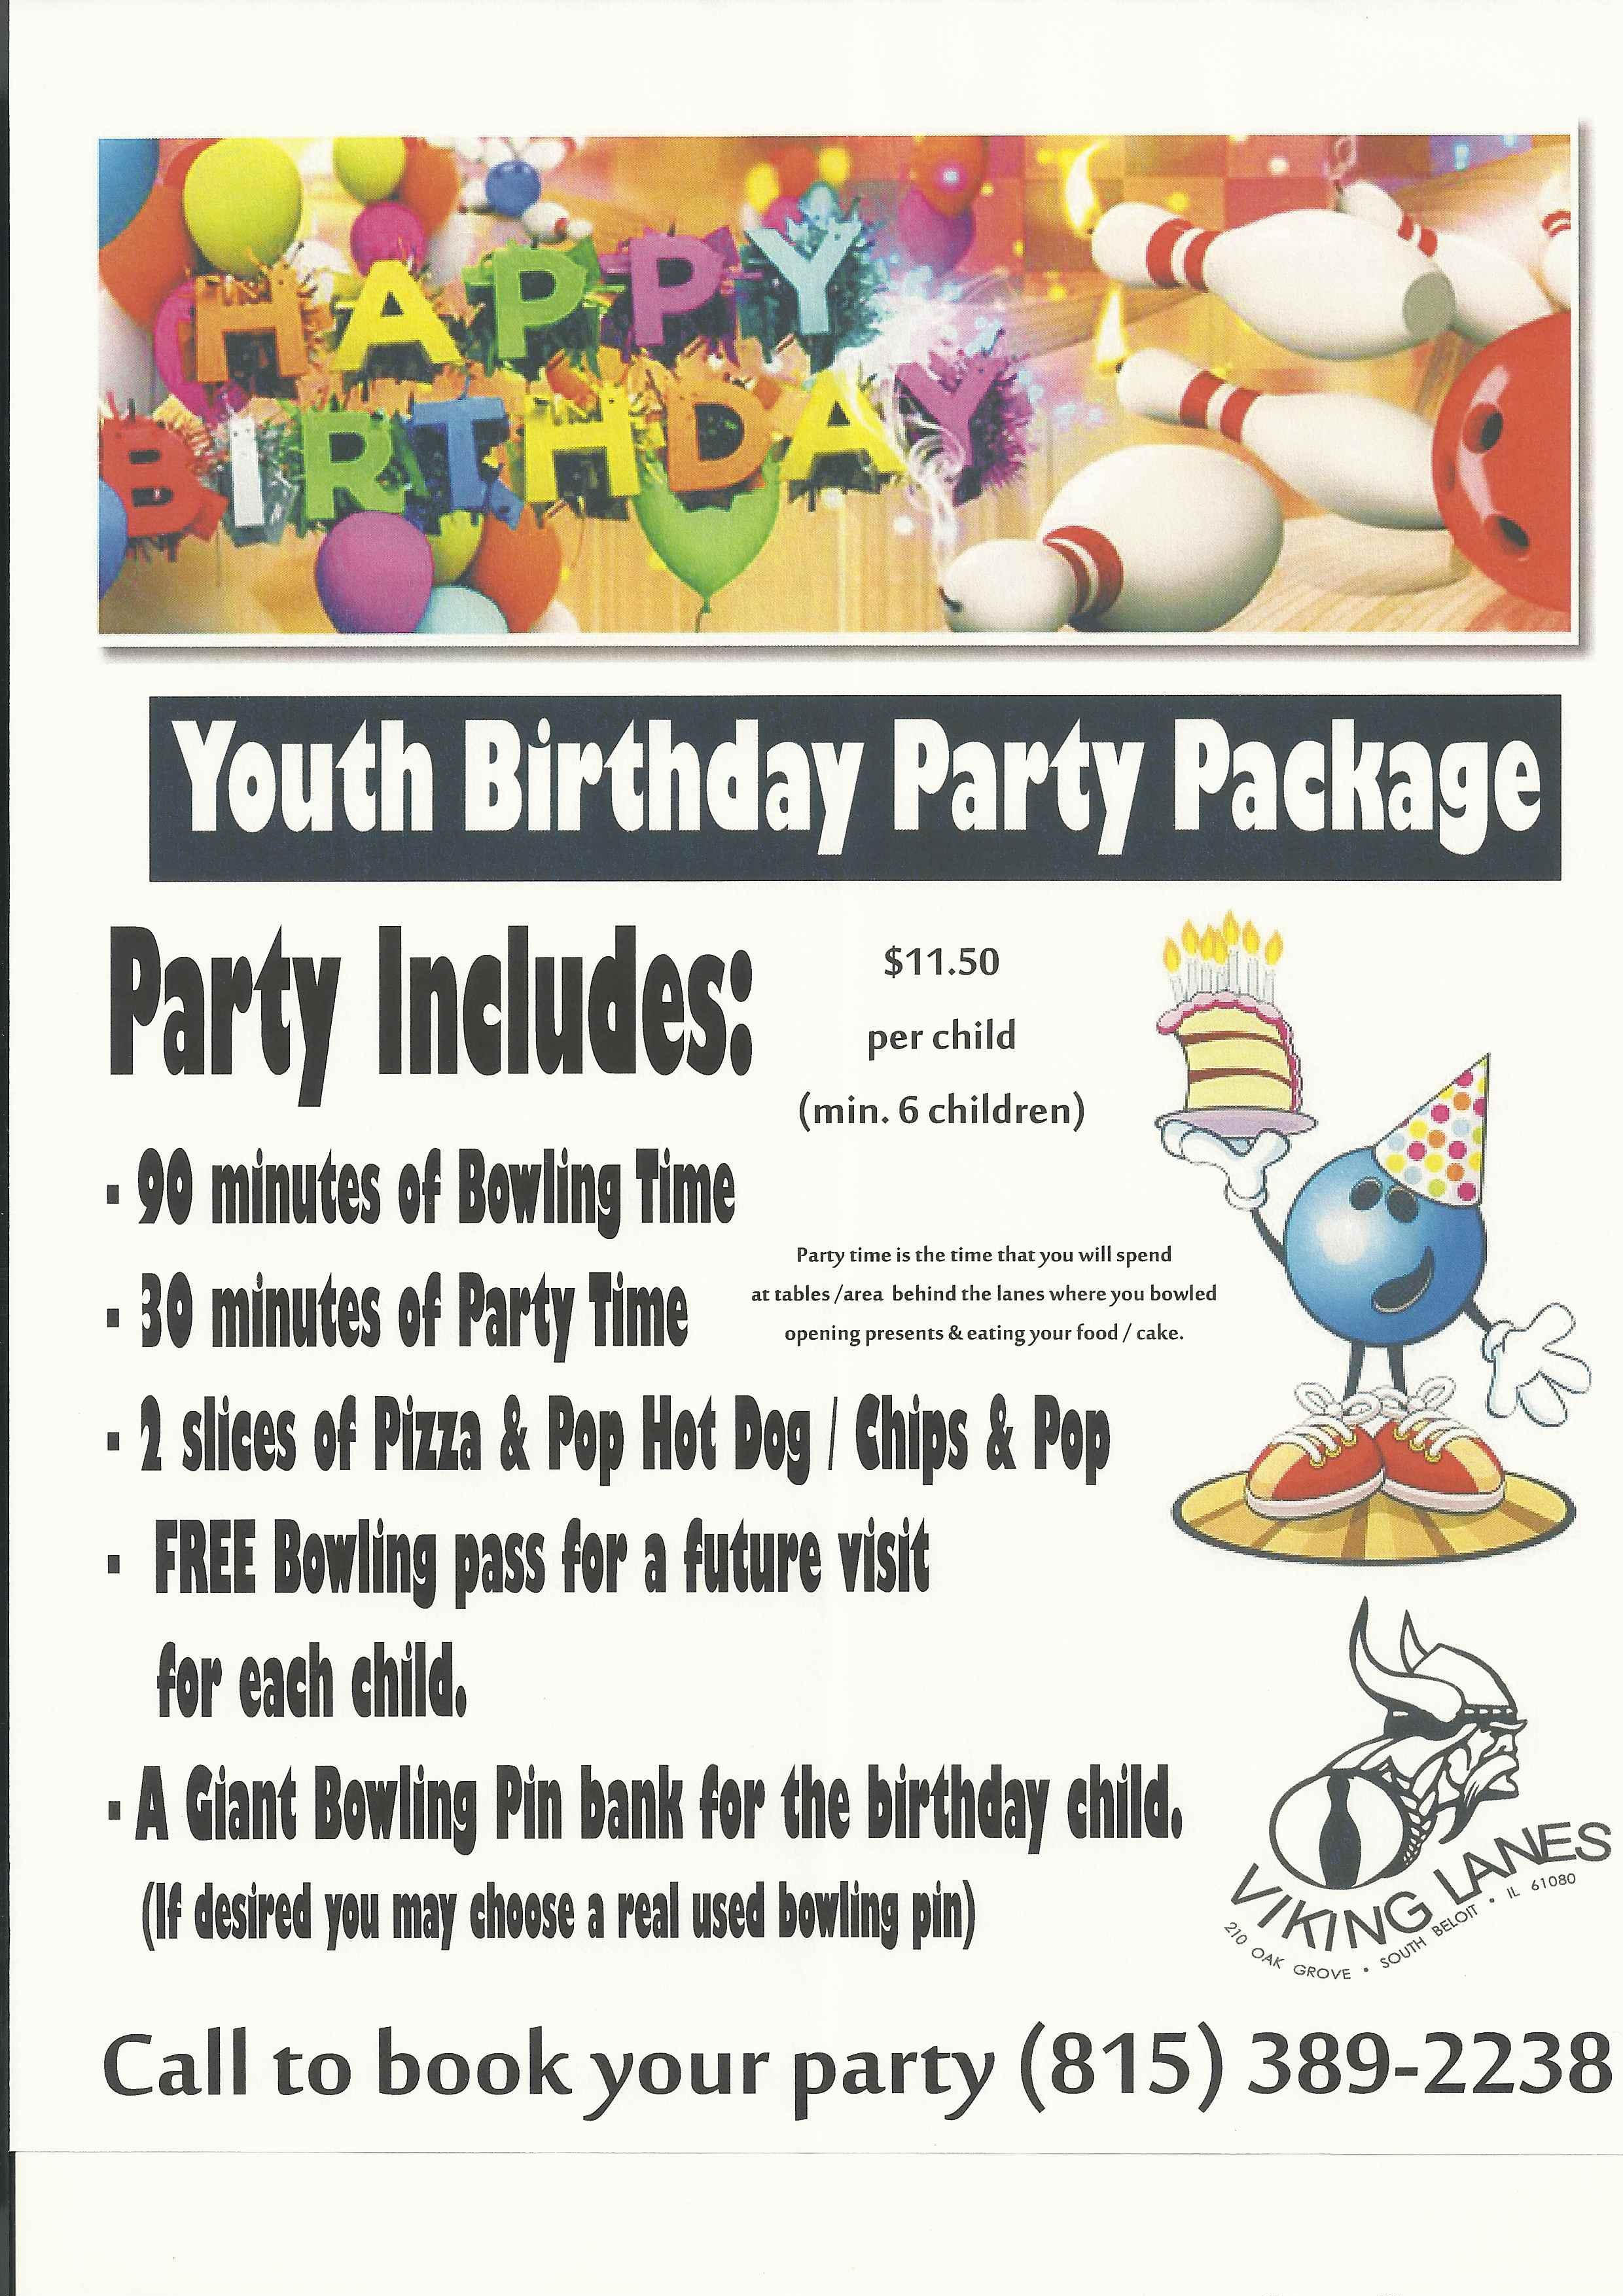 Kids Birthday Party Ideas | Birthday Parties | Viking Lanes